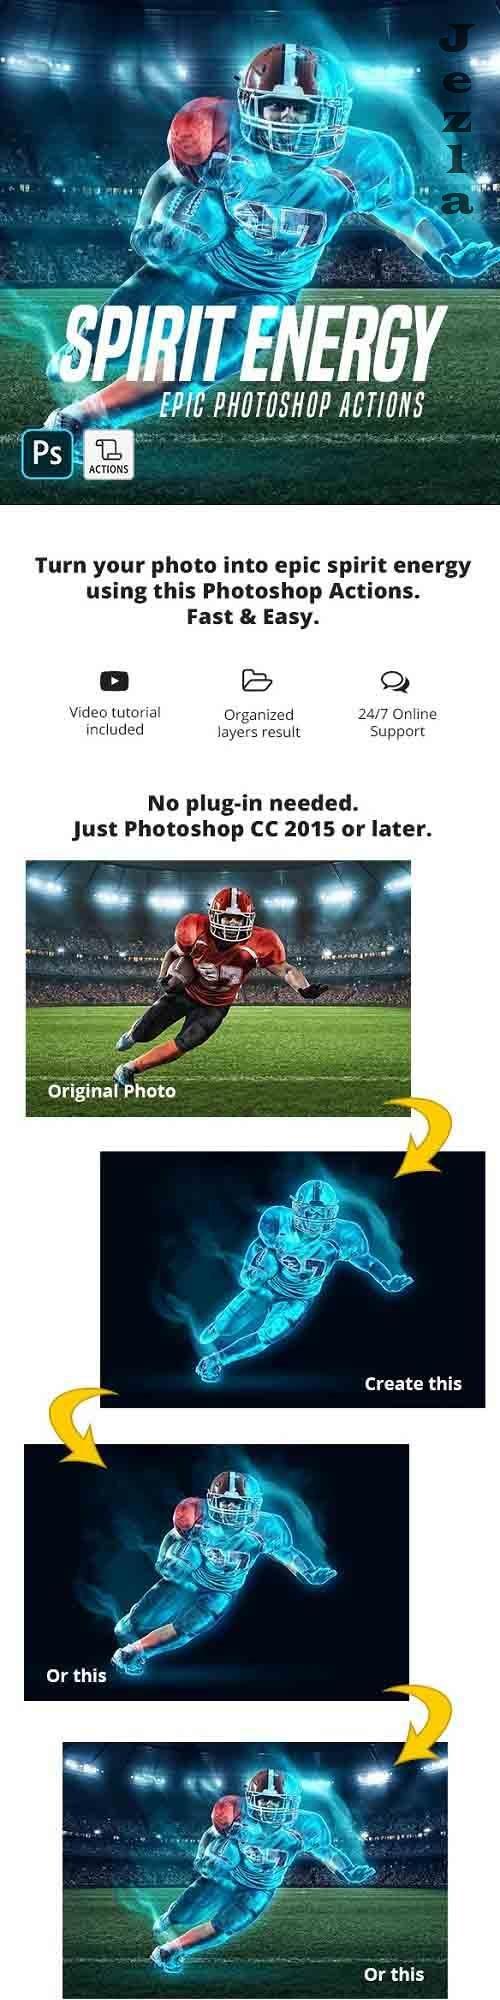 GraphicRiver - Spirit Energy Photoshop Action 29050788